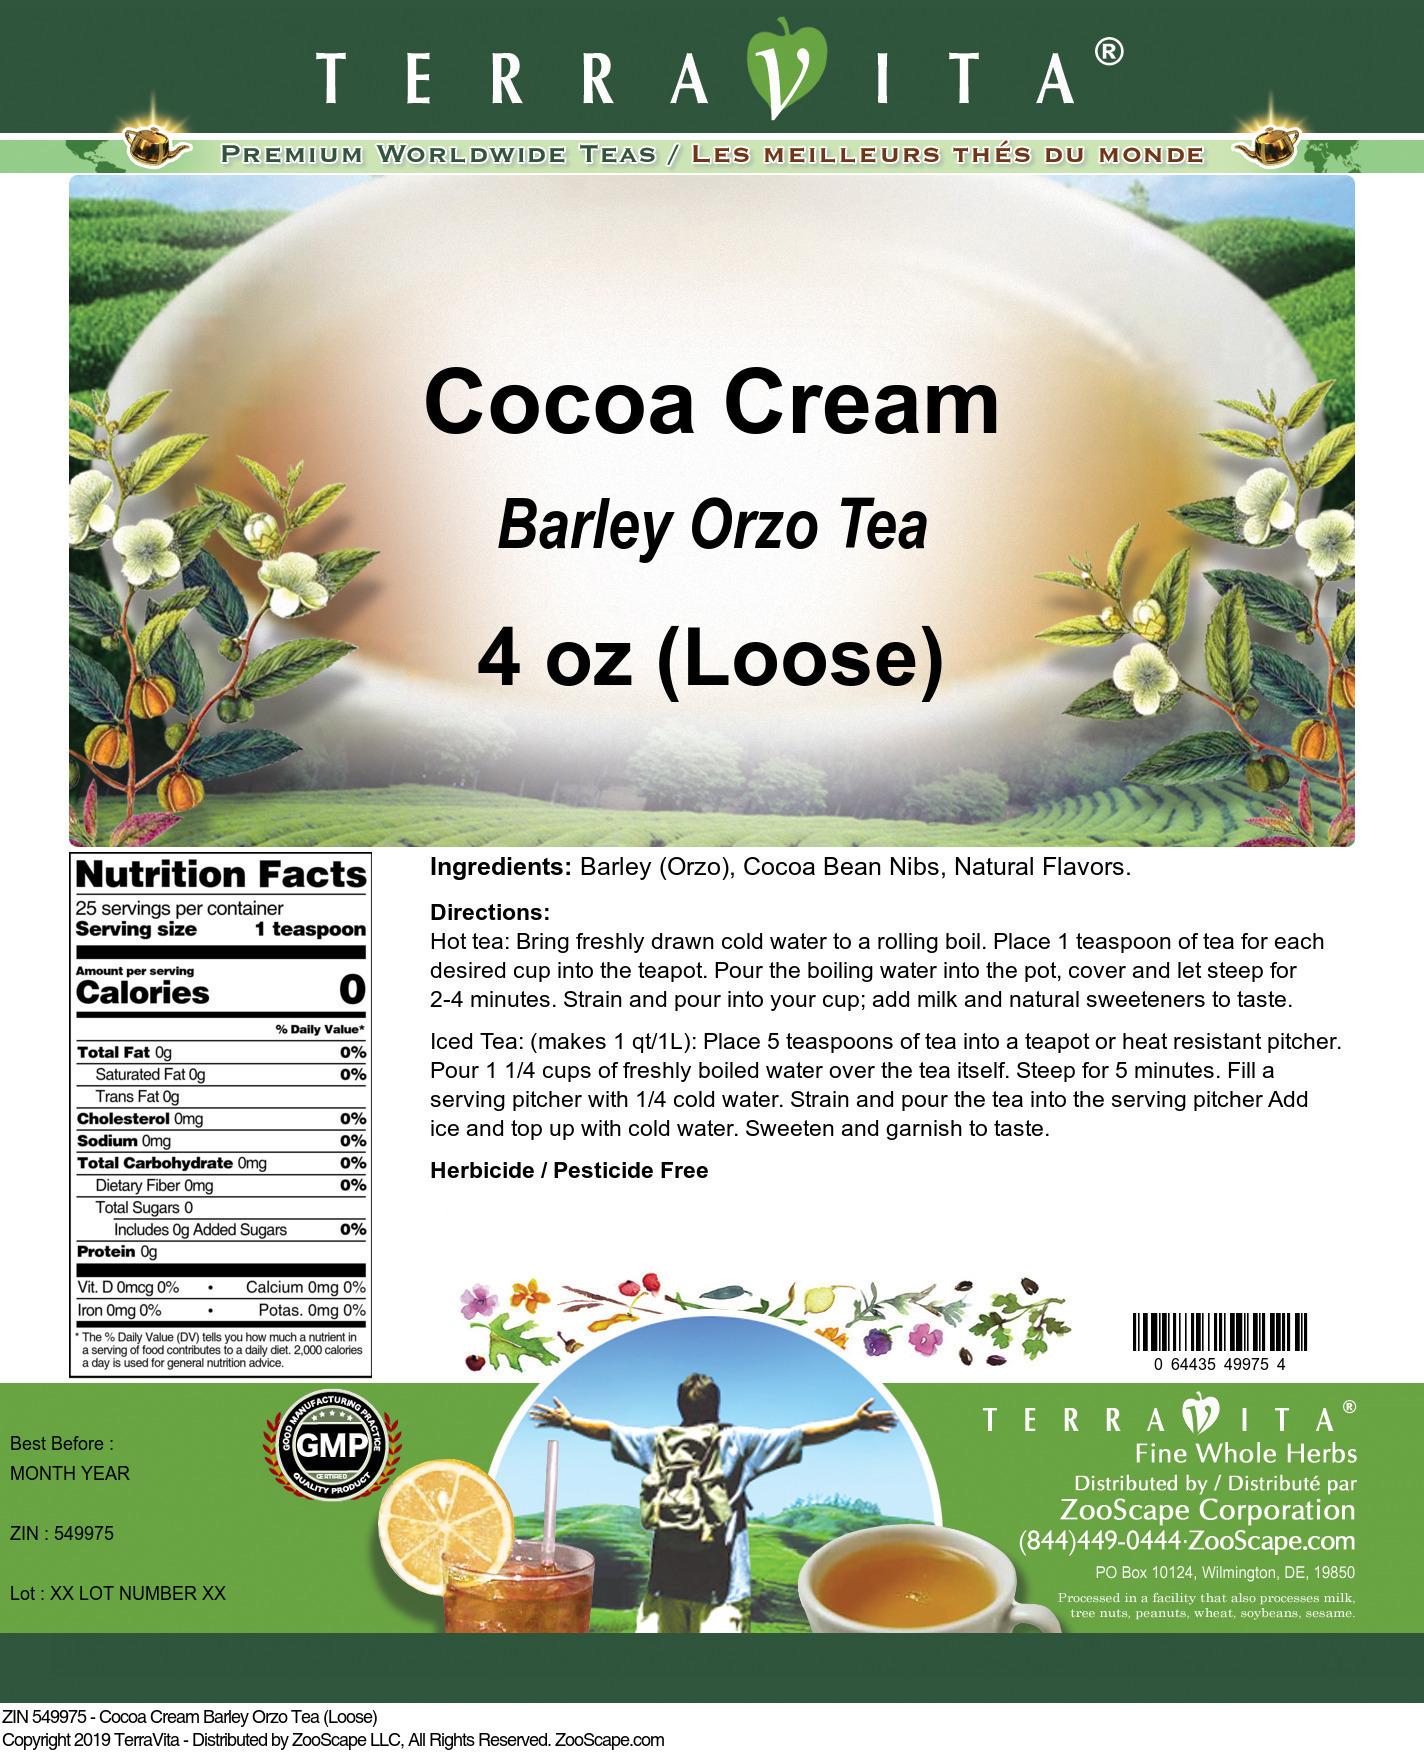 Cocoa Cream Barley Orzo Tea (Loose)